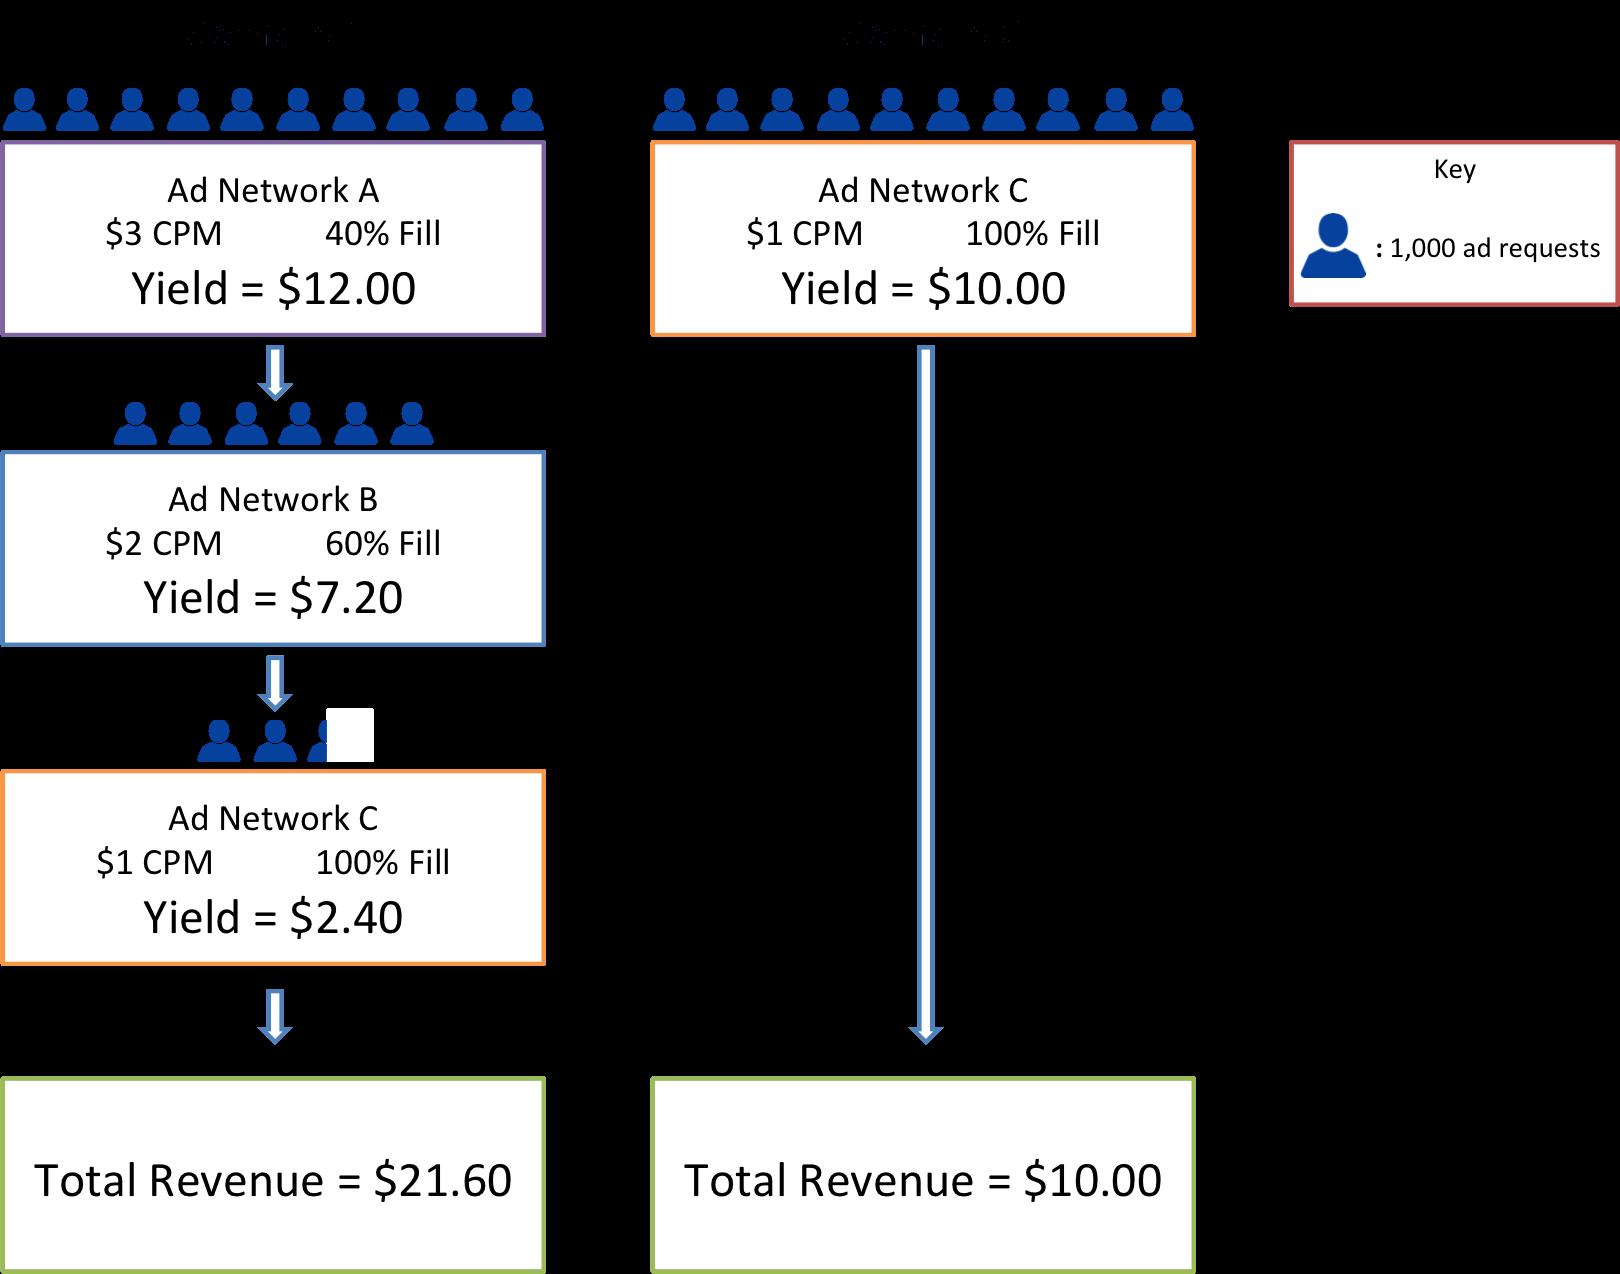 ad network scenarios chart